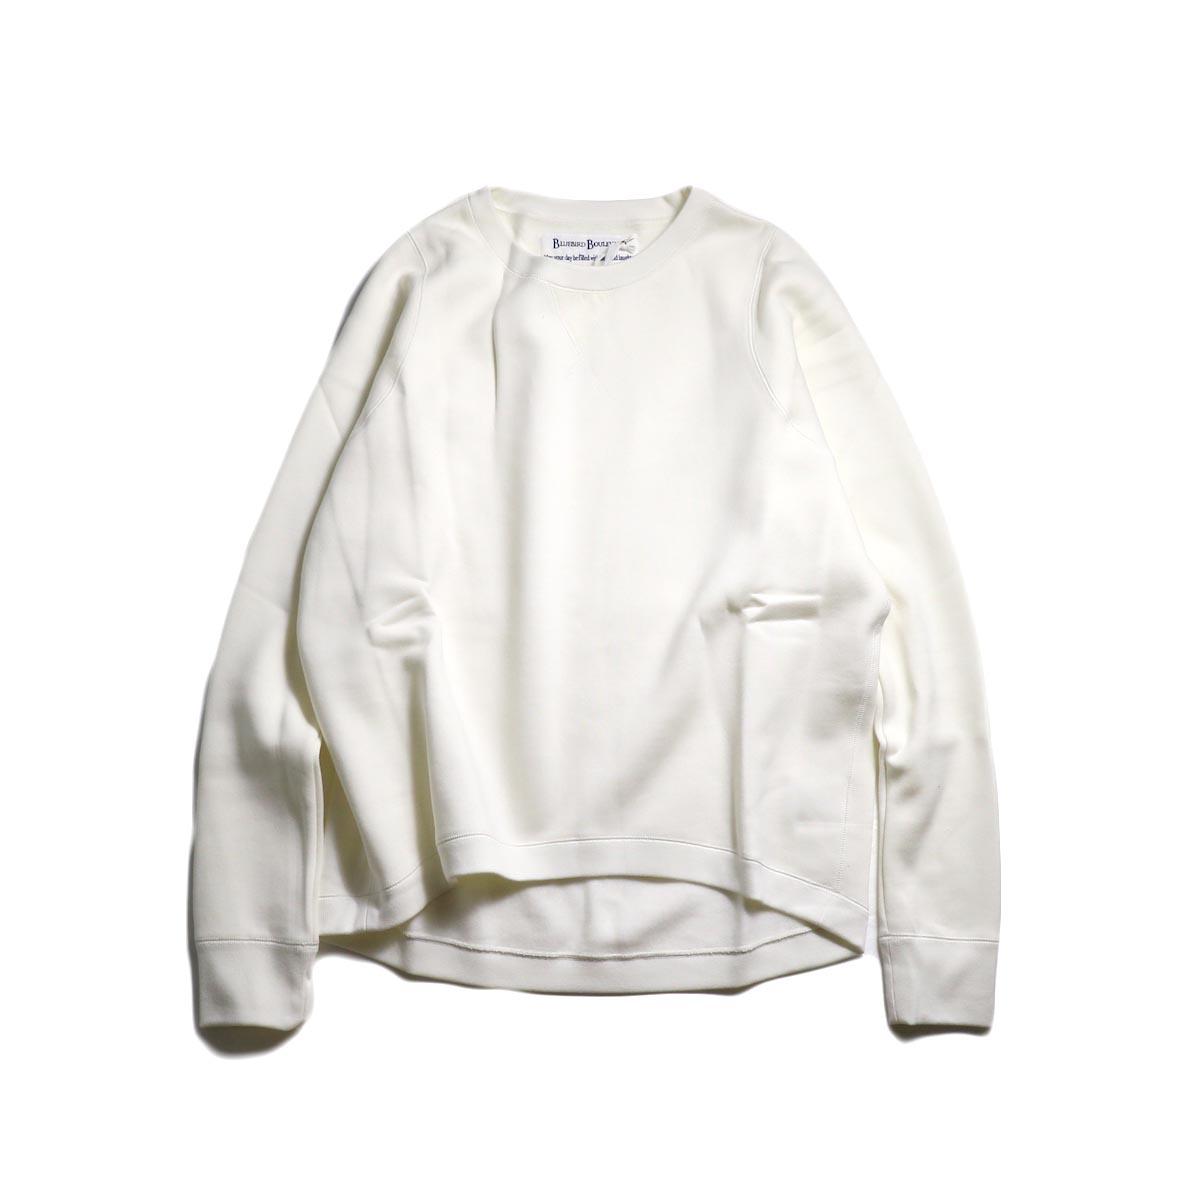 BLUEBIRD BOULEVARD / ビッグシルエットスウェットシャツ (White)